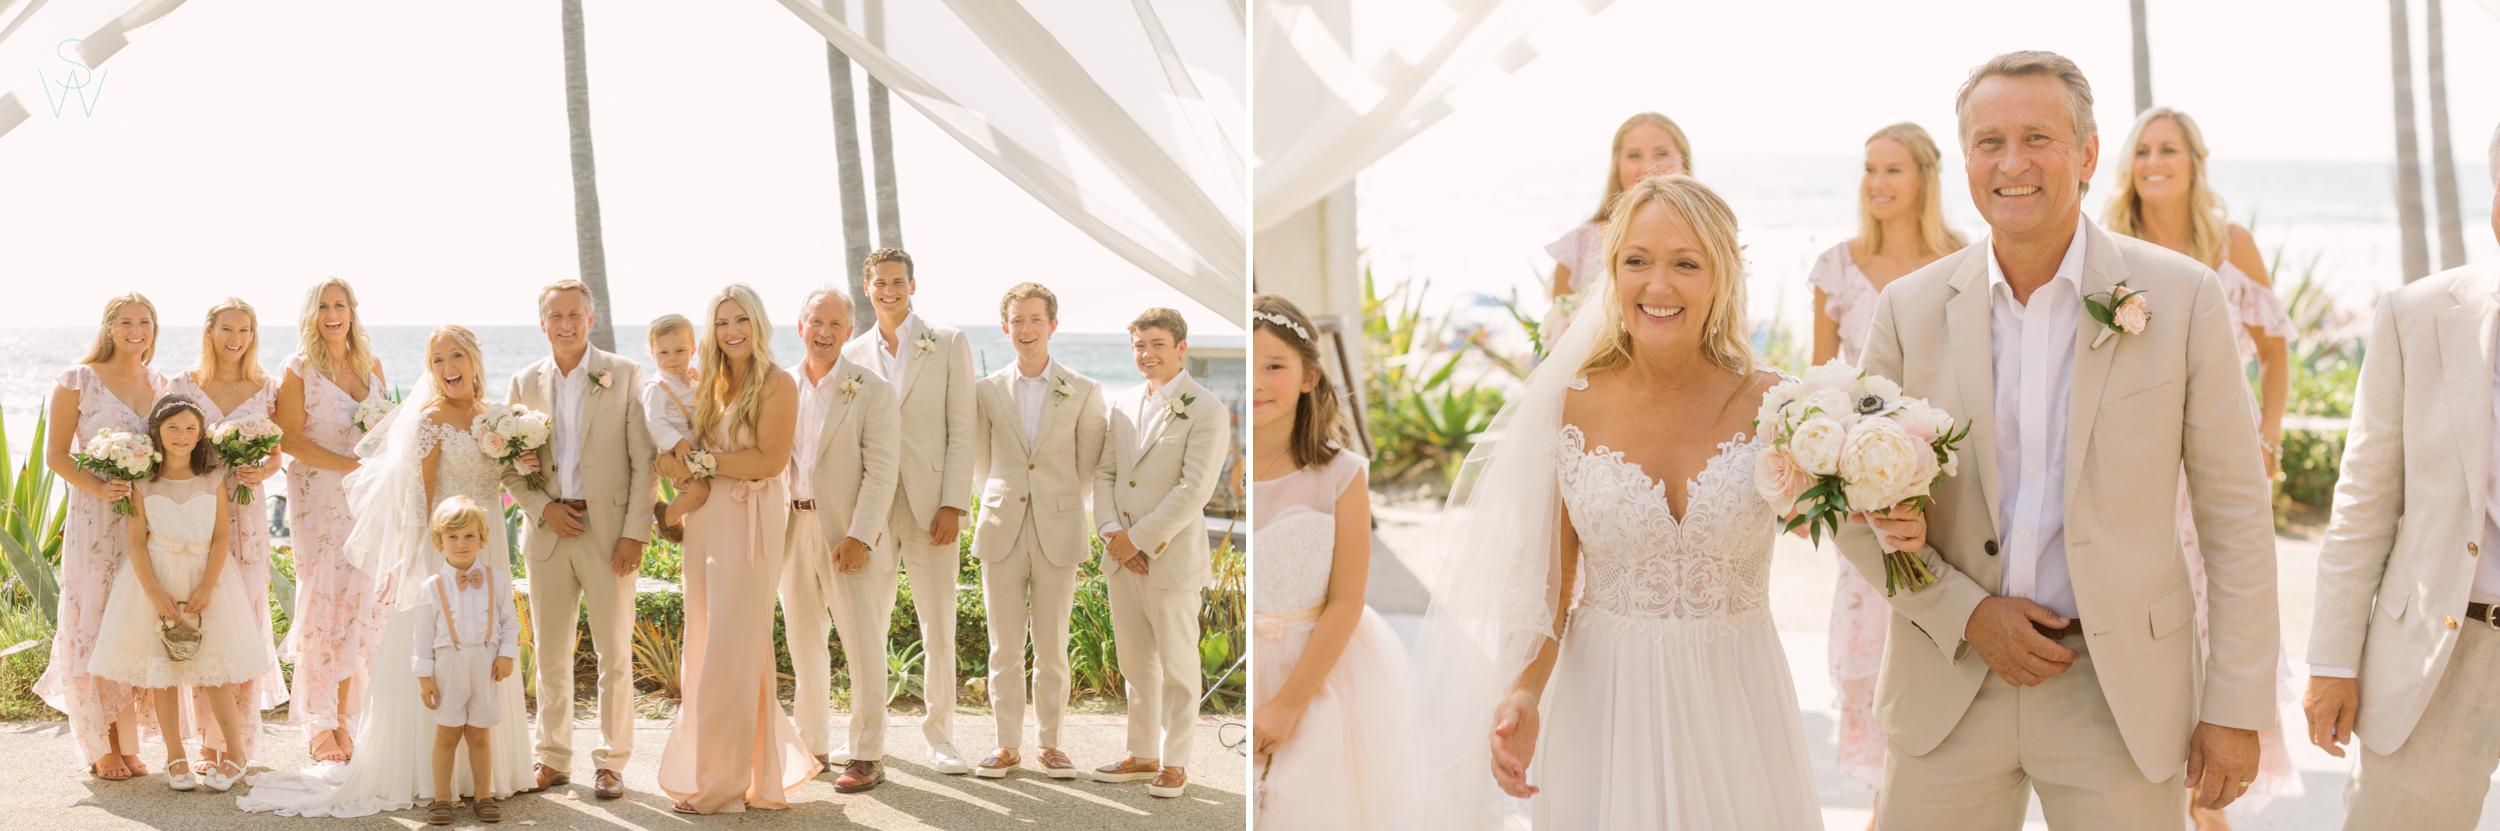 124DEL.MAR.WEDDINGS.photography.shewanders.JPG